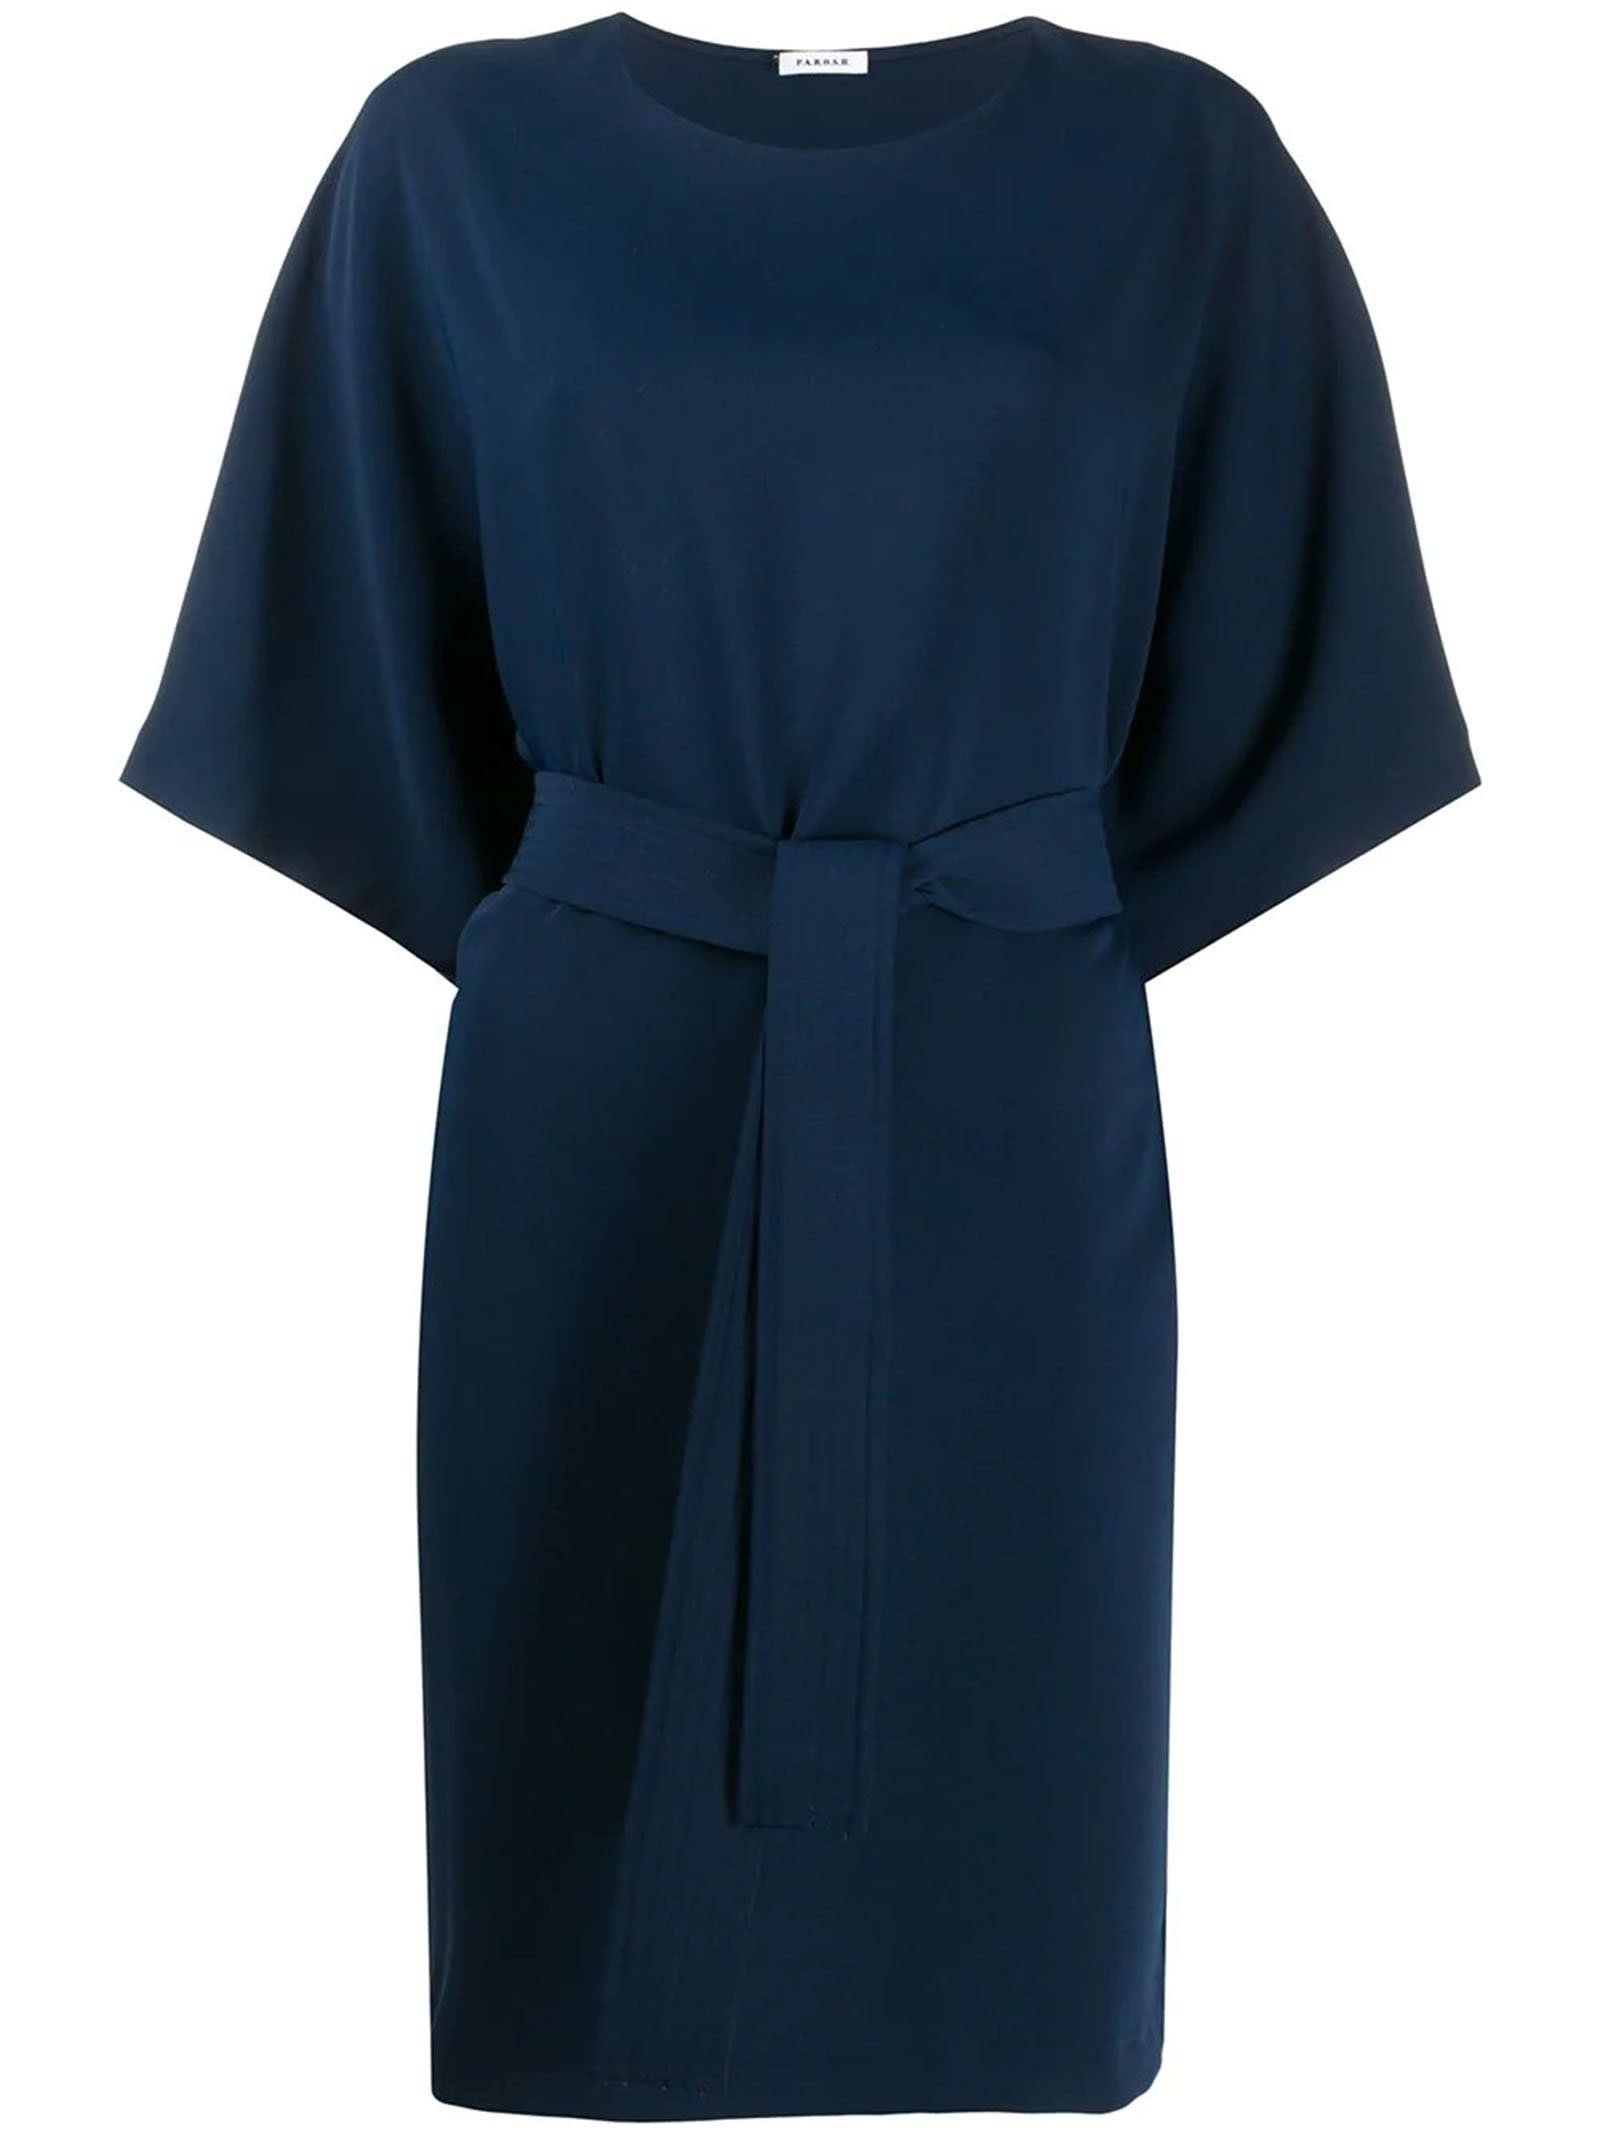 Parosh Panters Blue Dress